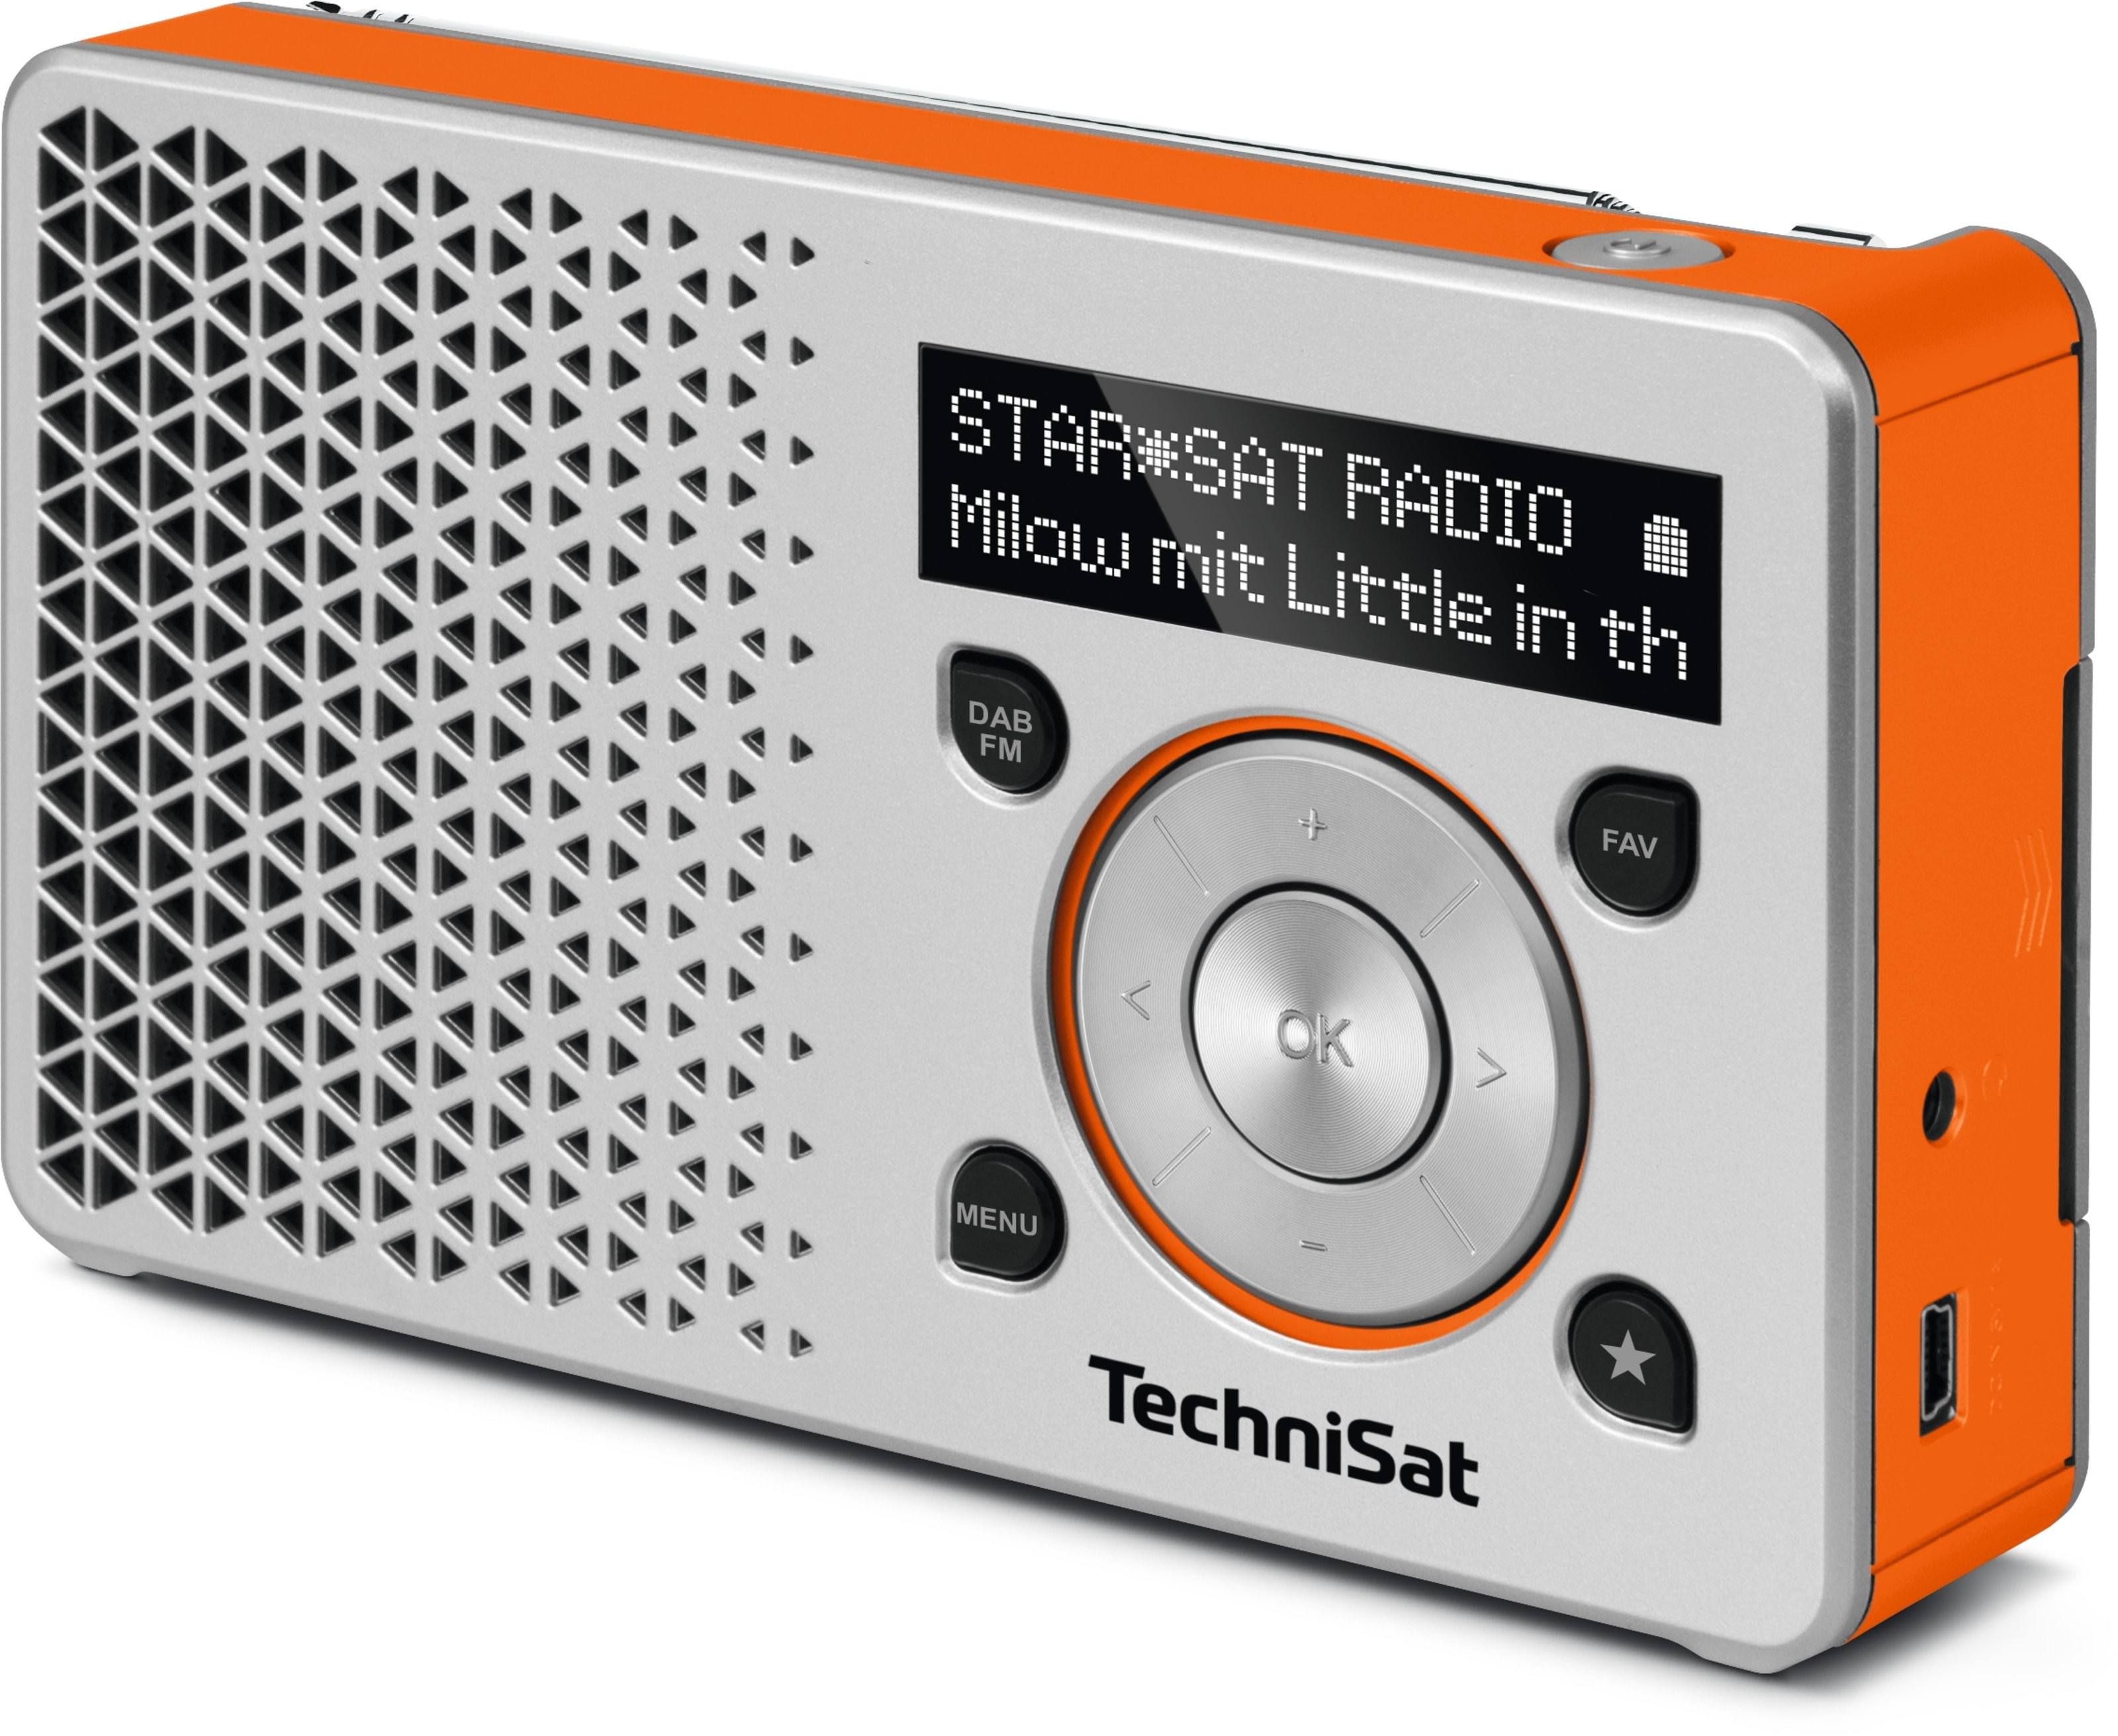 TechniSat DigitRadio 1, silber / orange